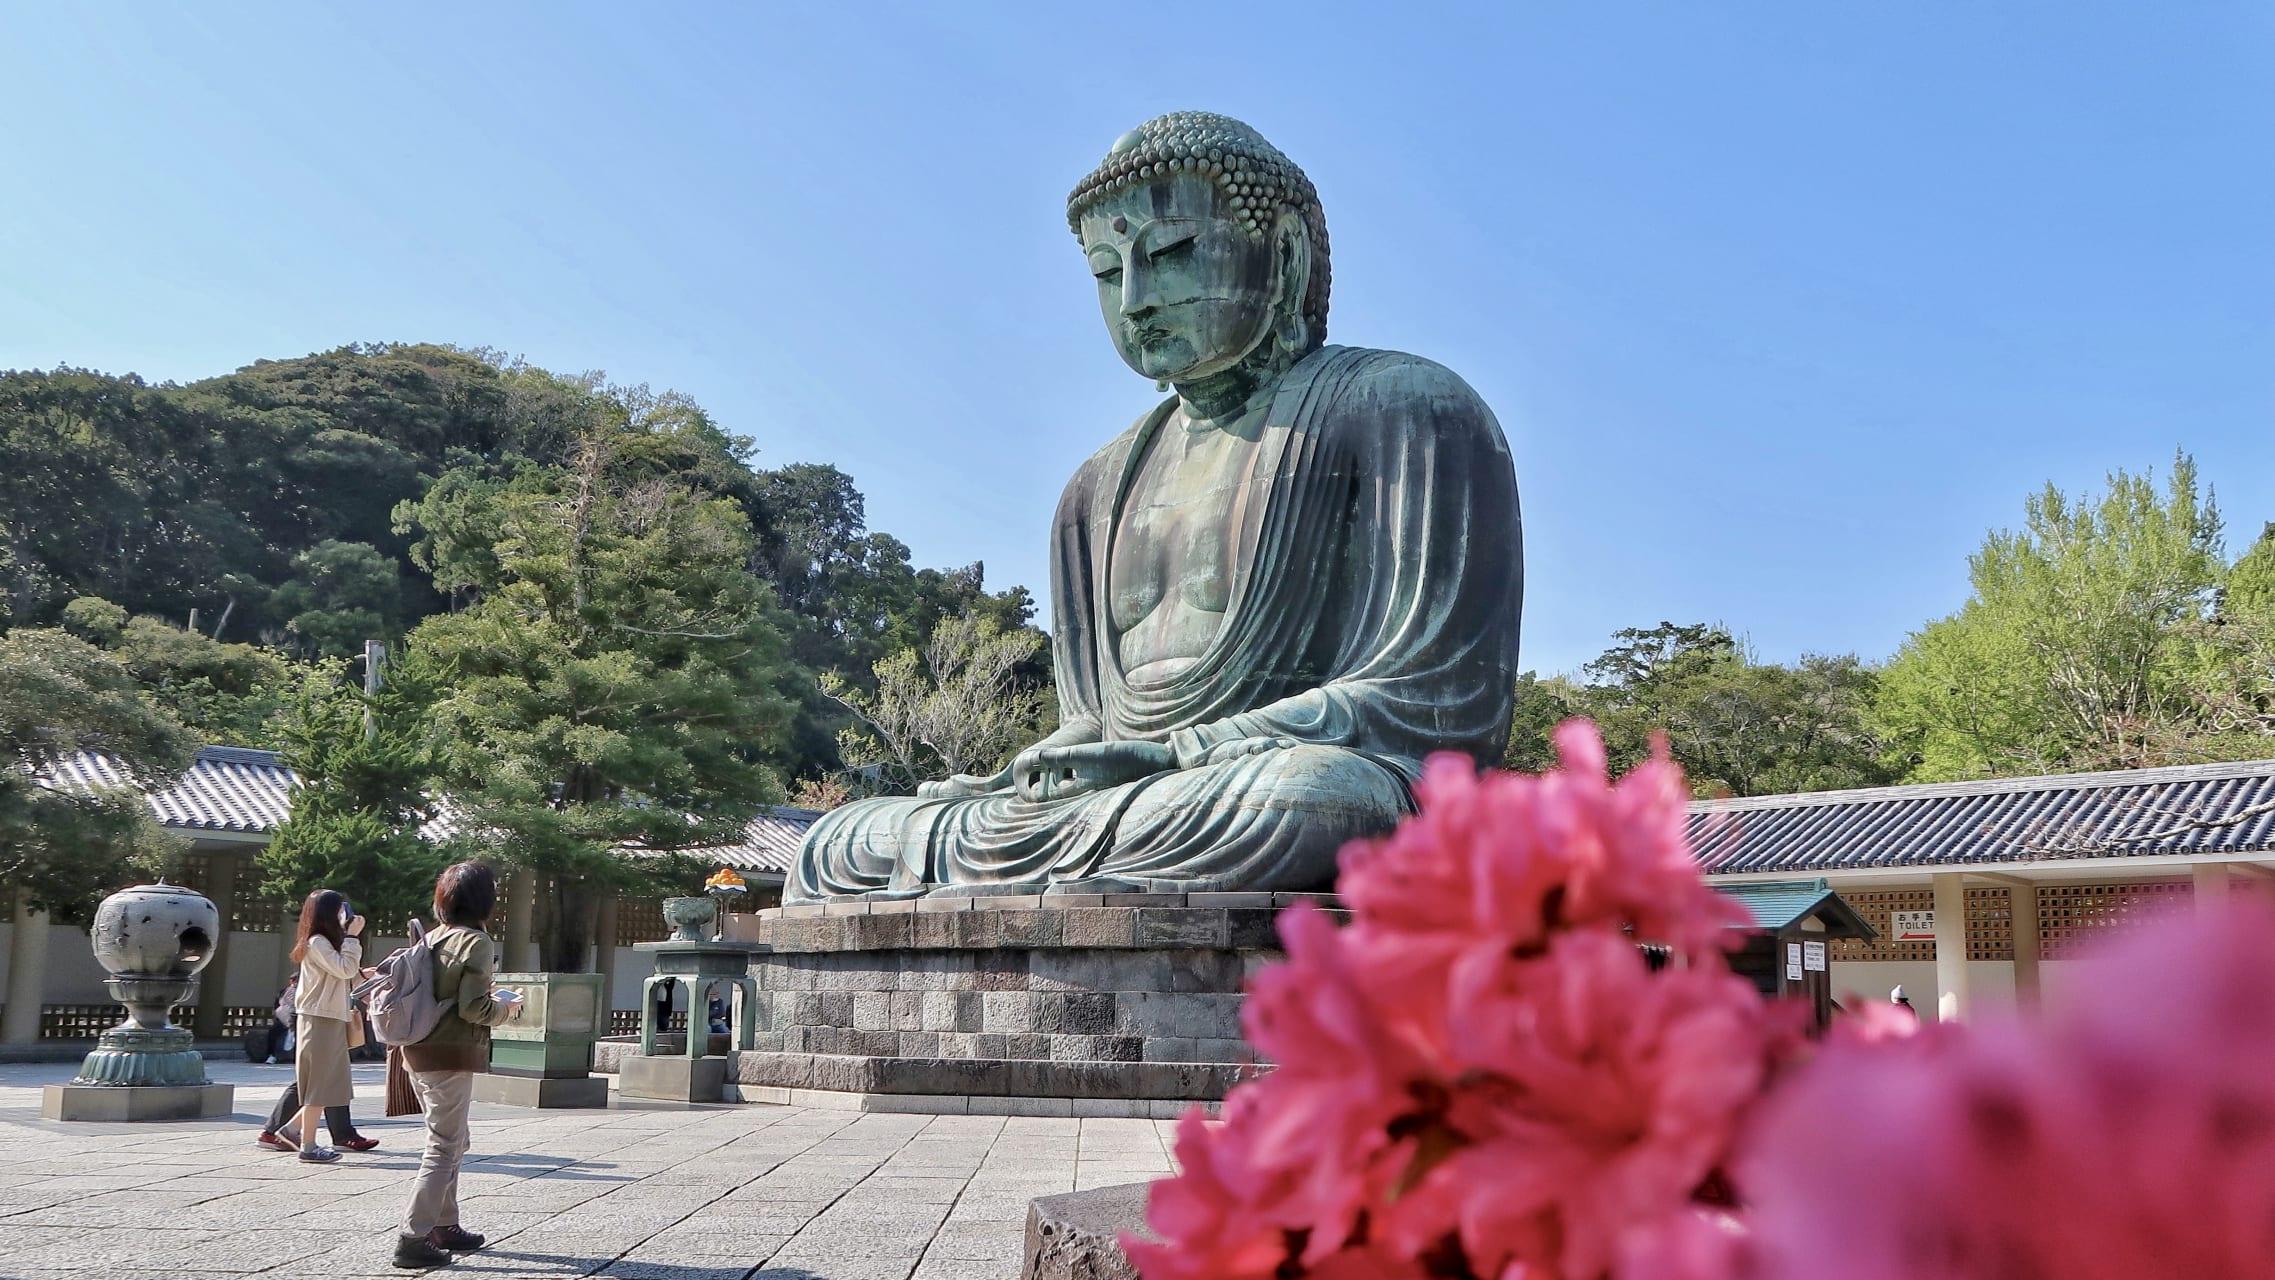 Kanagawa - Meet the Great Buddha, a National Treasure of Japan